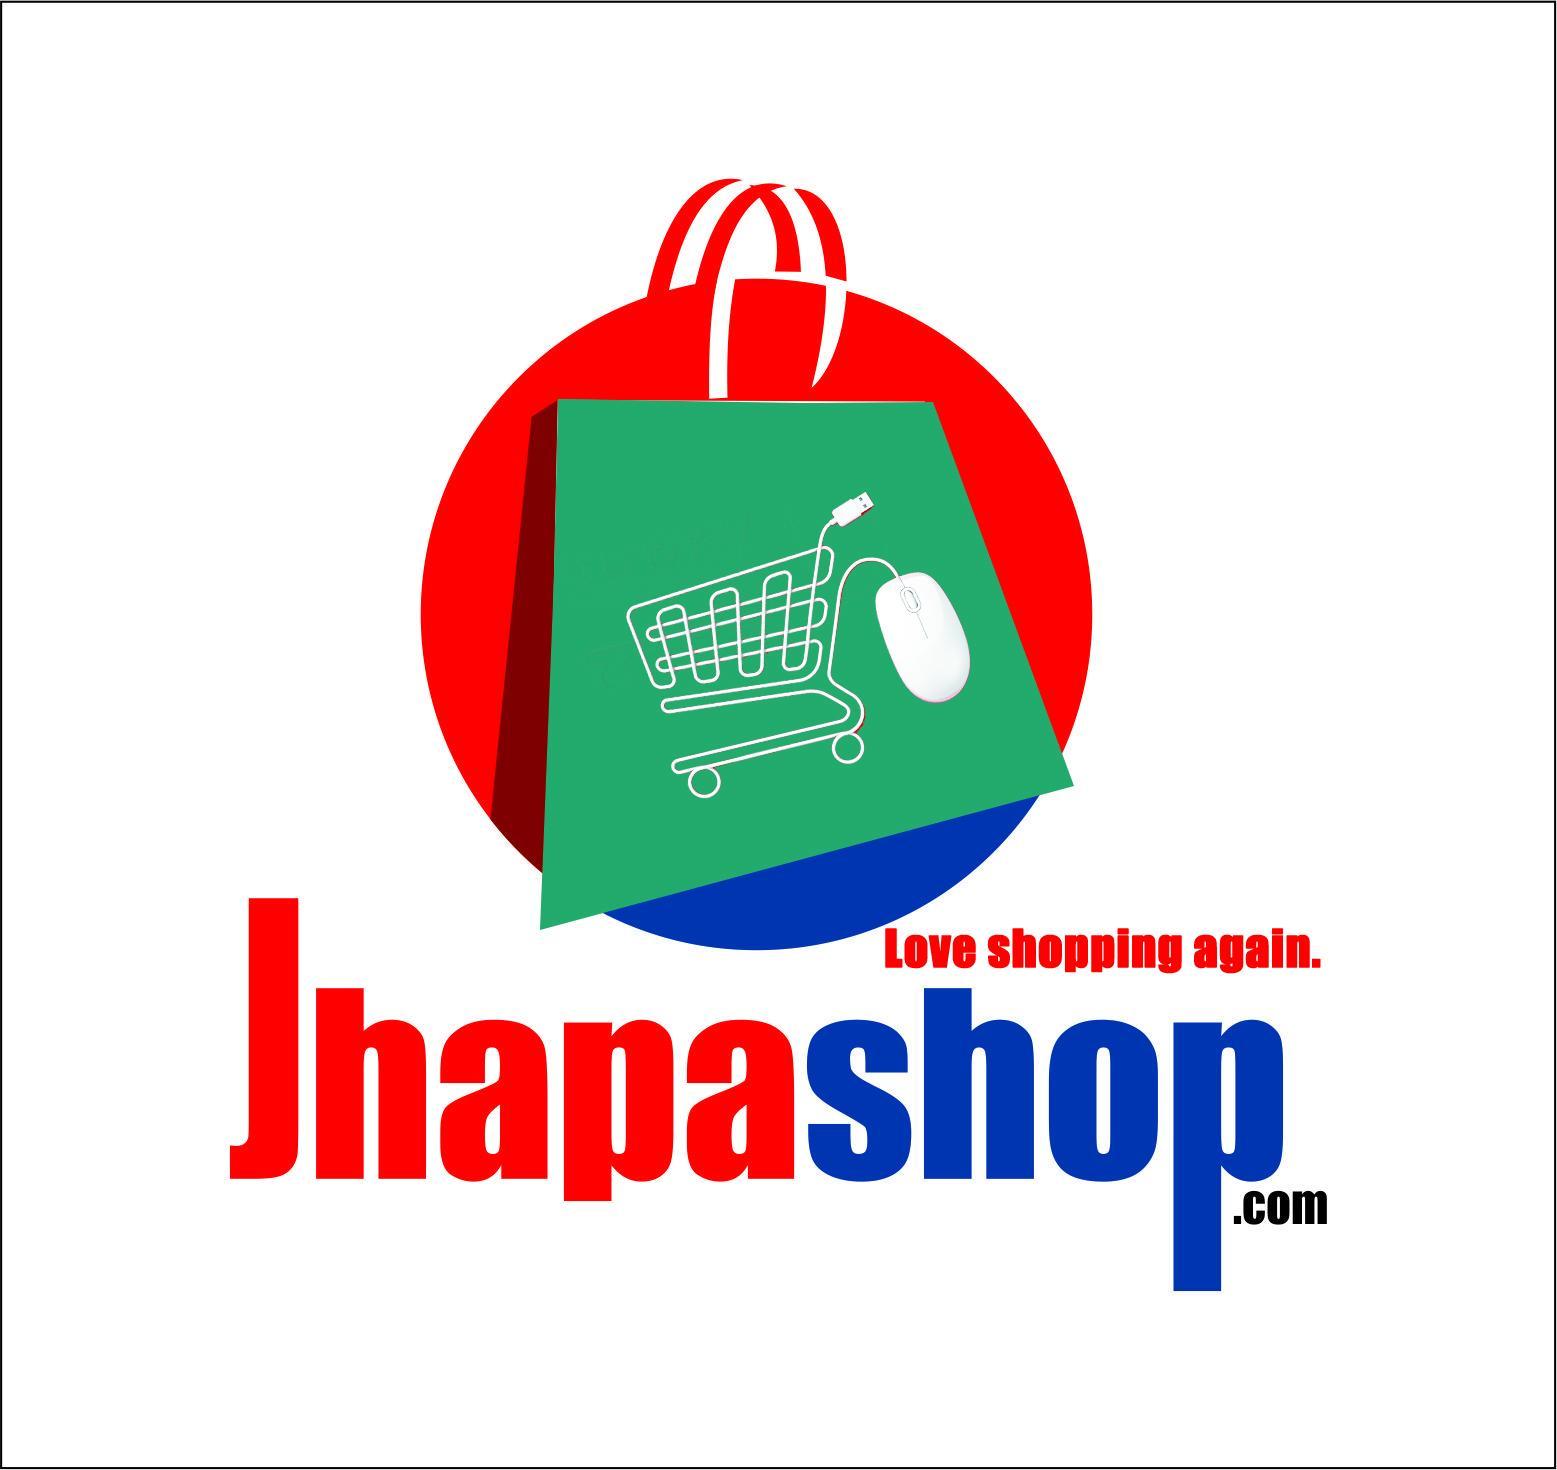 Jhapashop.com